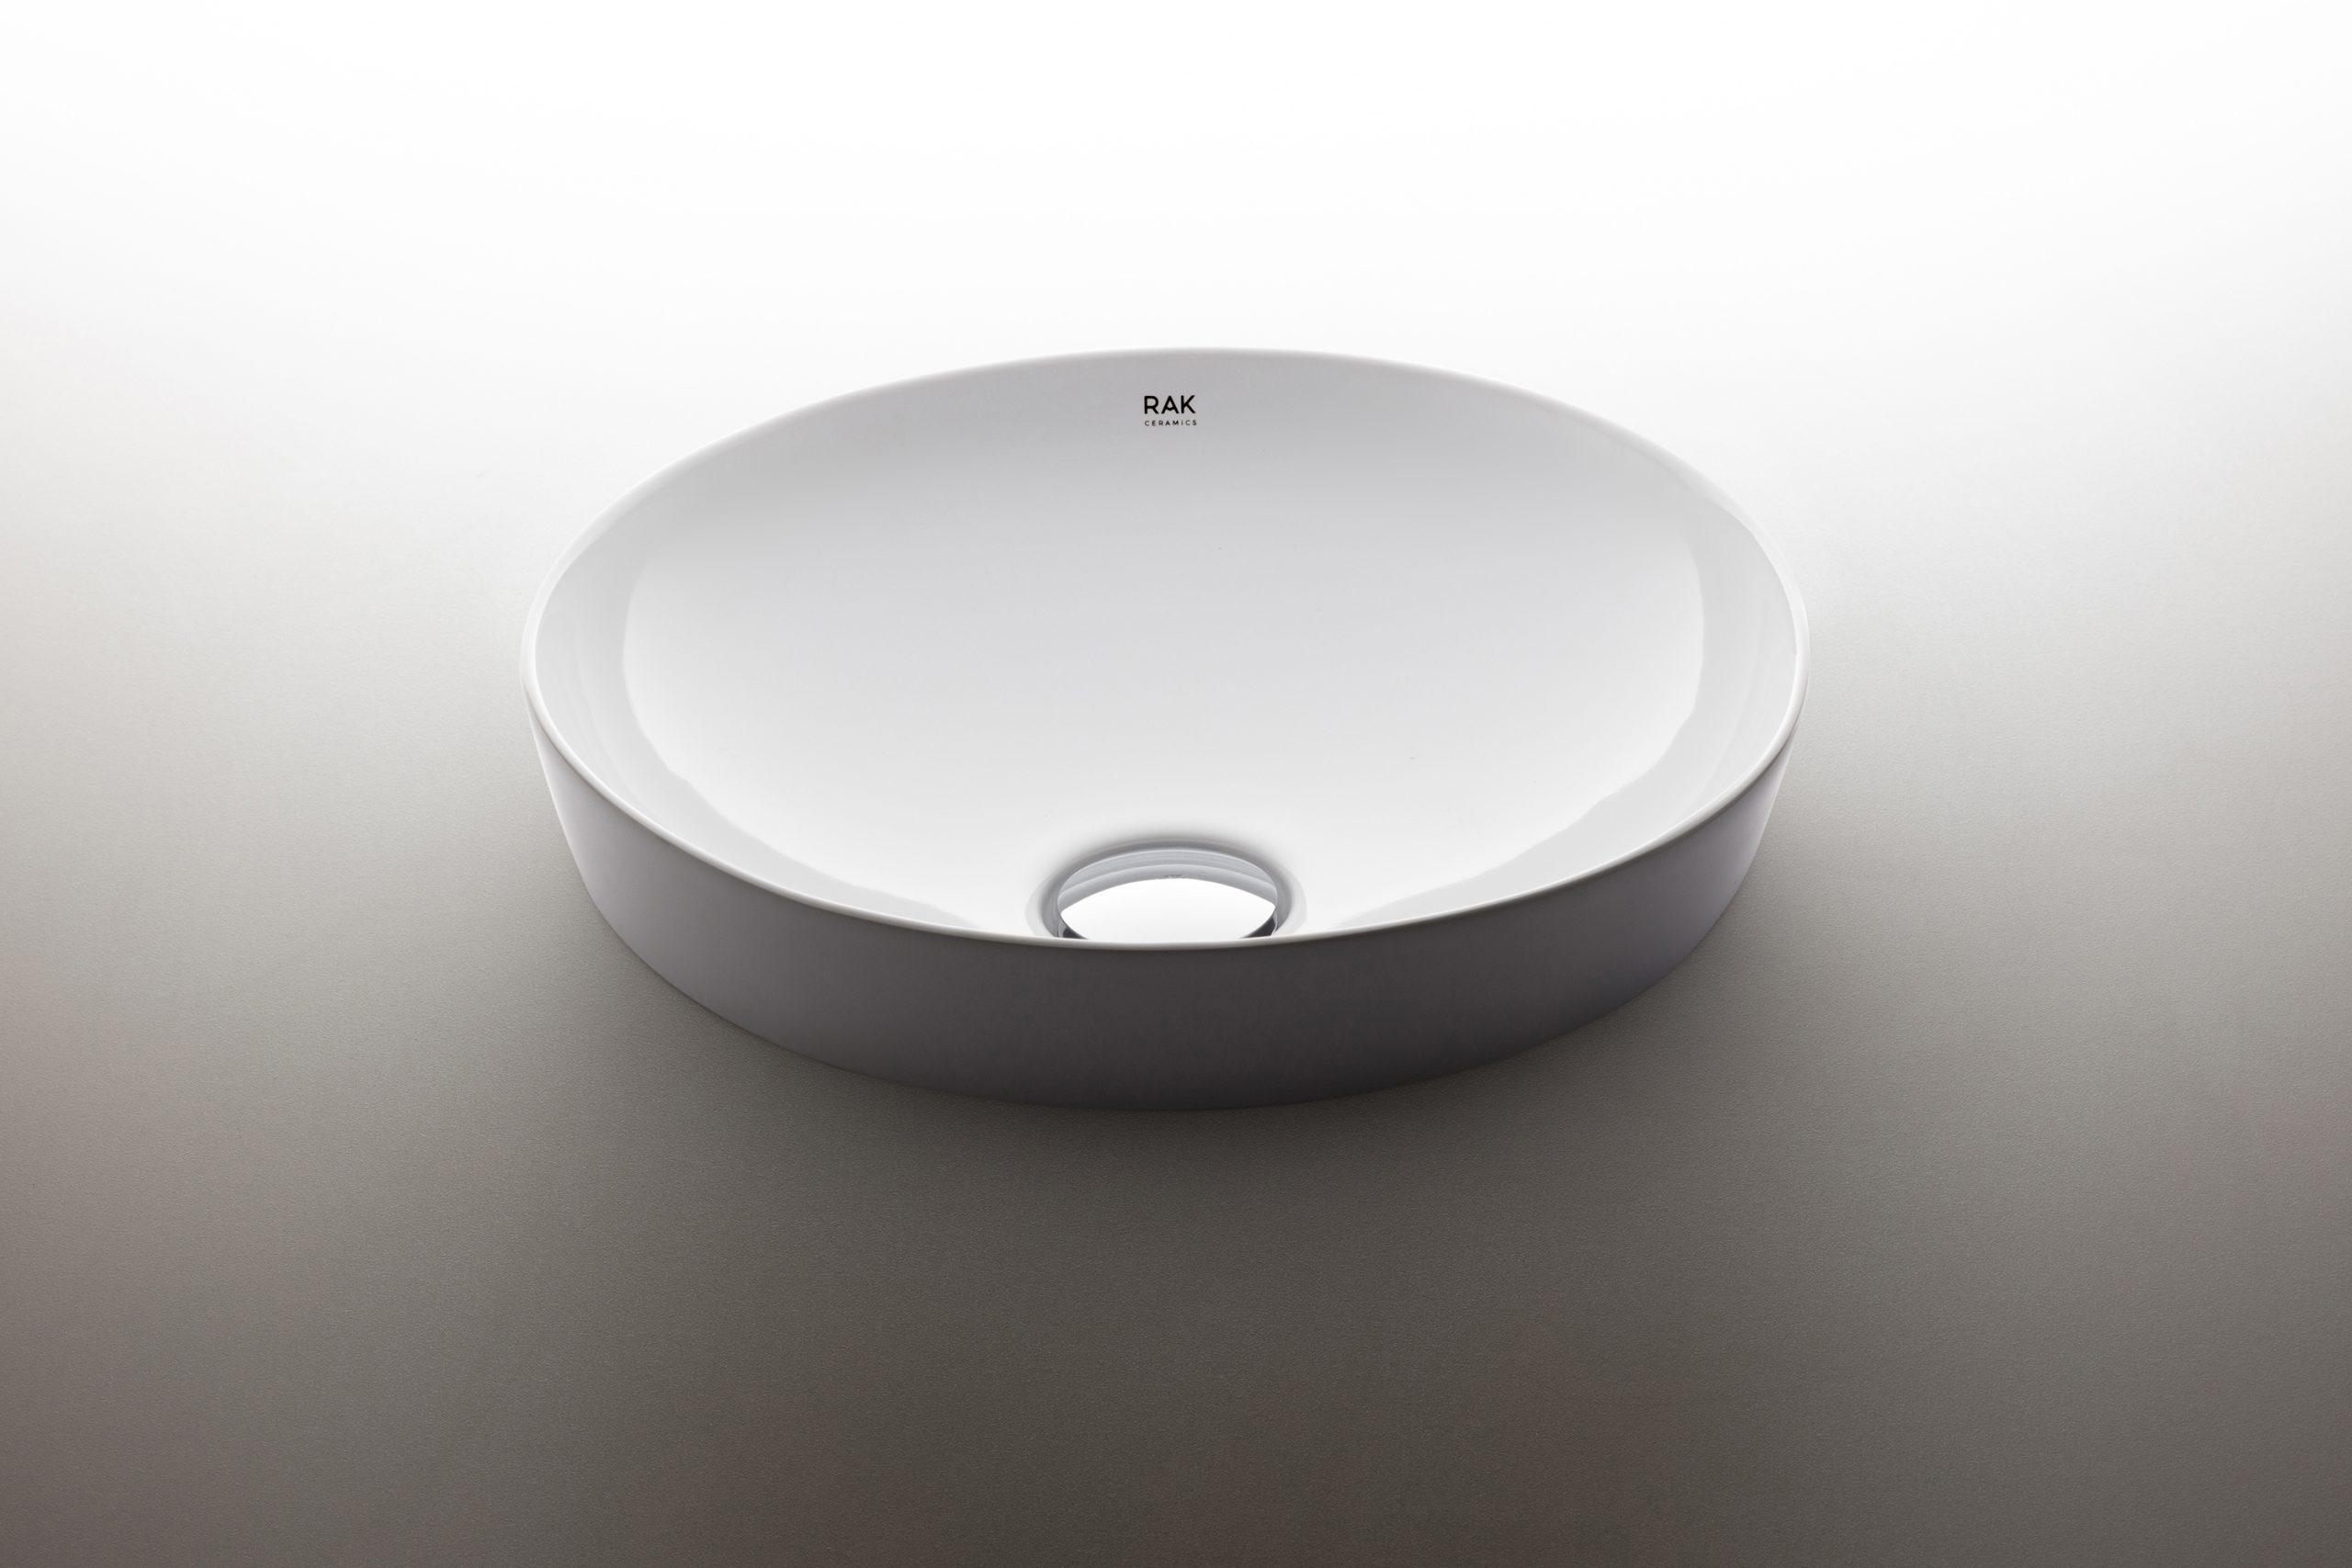 Semi built-in Round Variant washbasin designed by Debiasi Sandri for RAK Ceramics